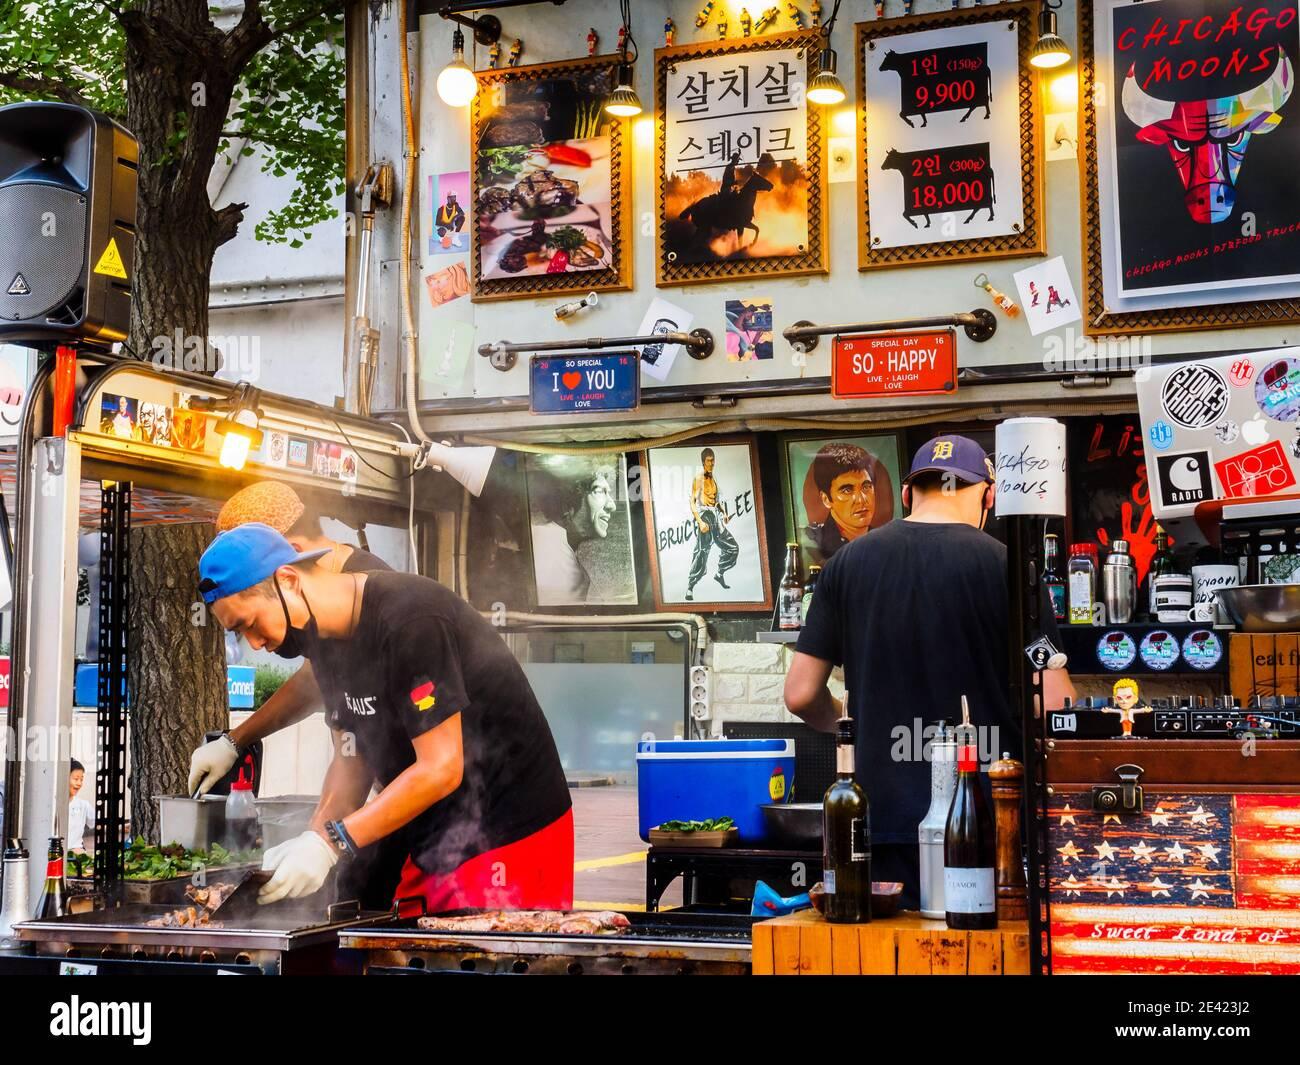 Seoul, South Korea - June 17, 2017: Vendors preparing fast food in the fast food kiosk at the street in Seoul. Stock Photo